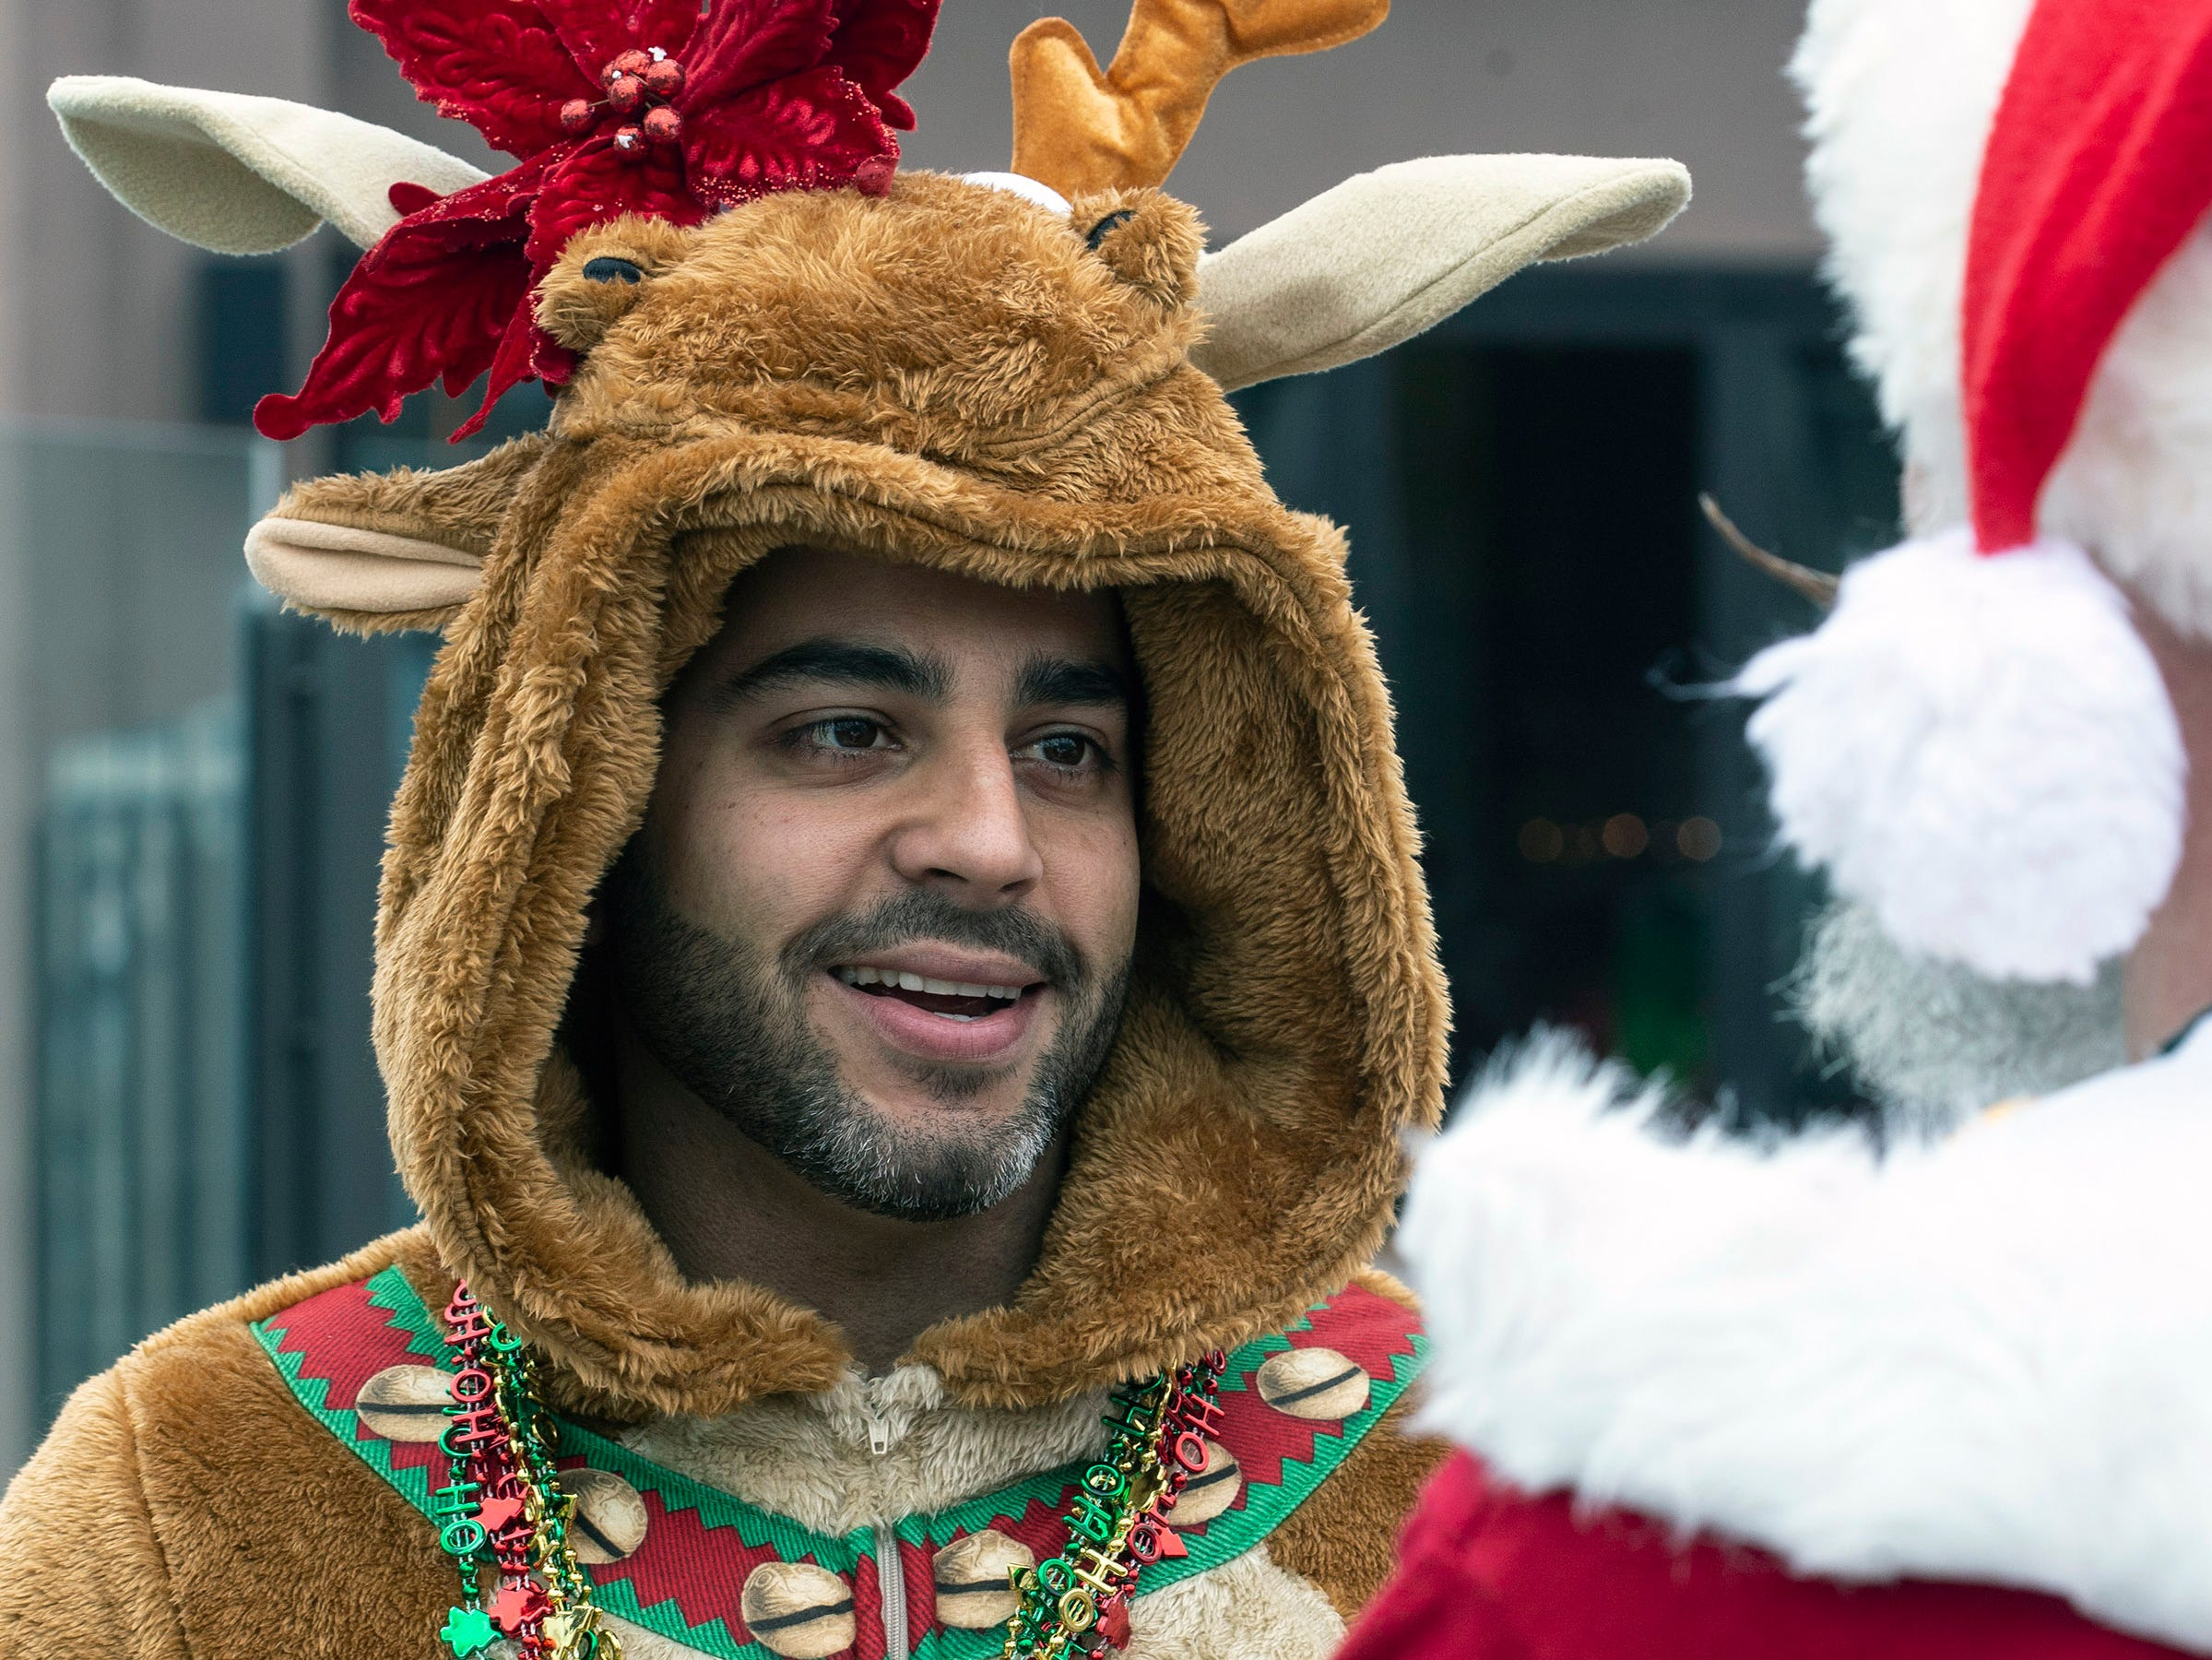 Alain Benitez donned the reindeer costume for SantaCon on Saturday. 12/8/18